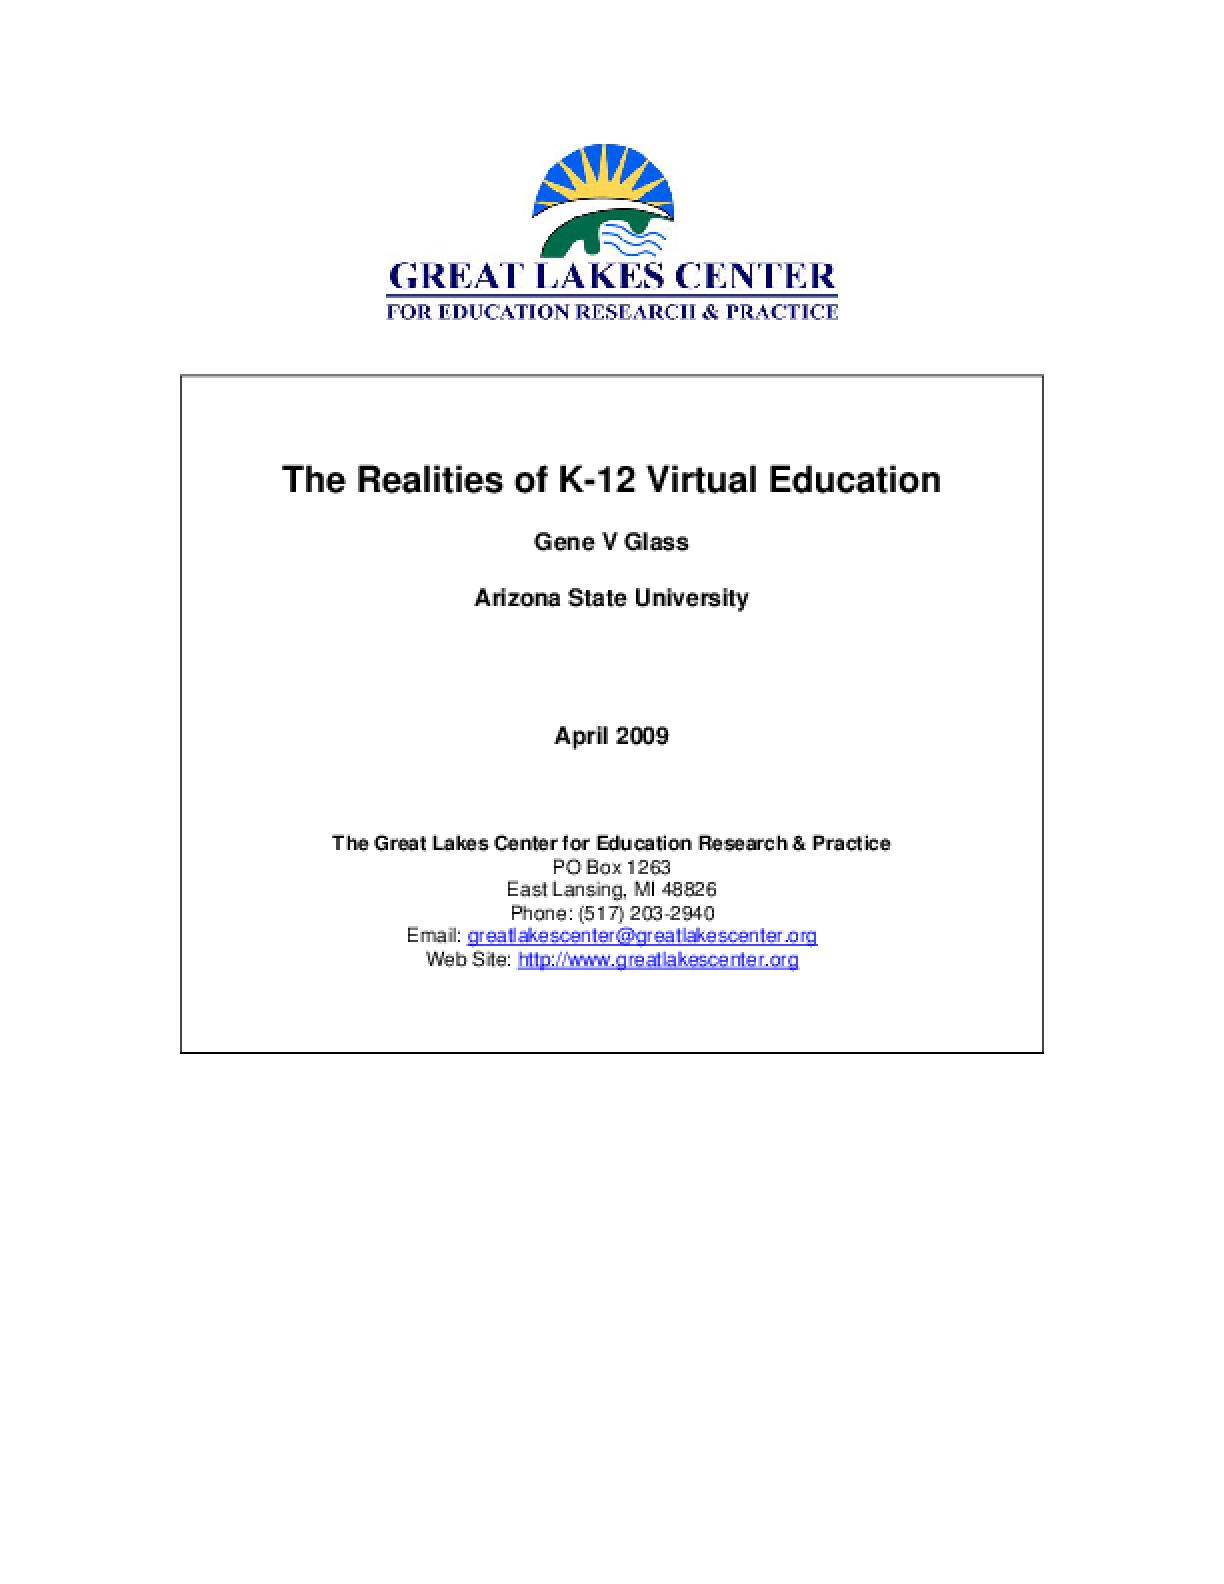 Realities of K-12 Virtual Education, The